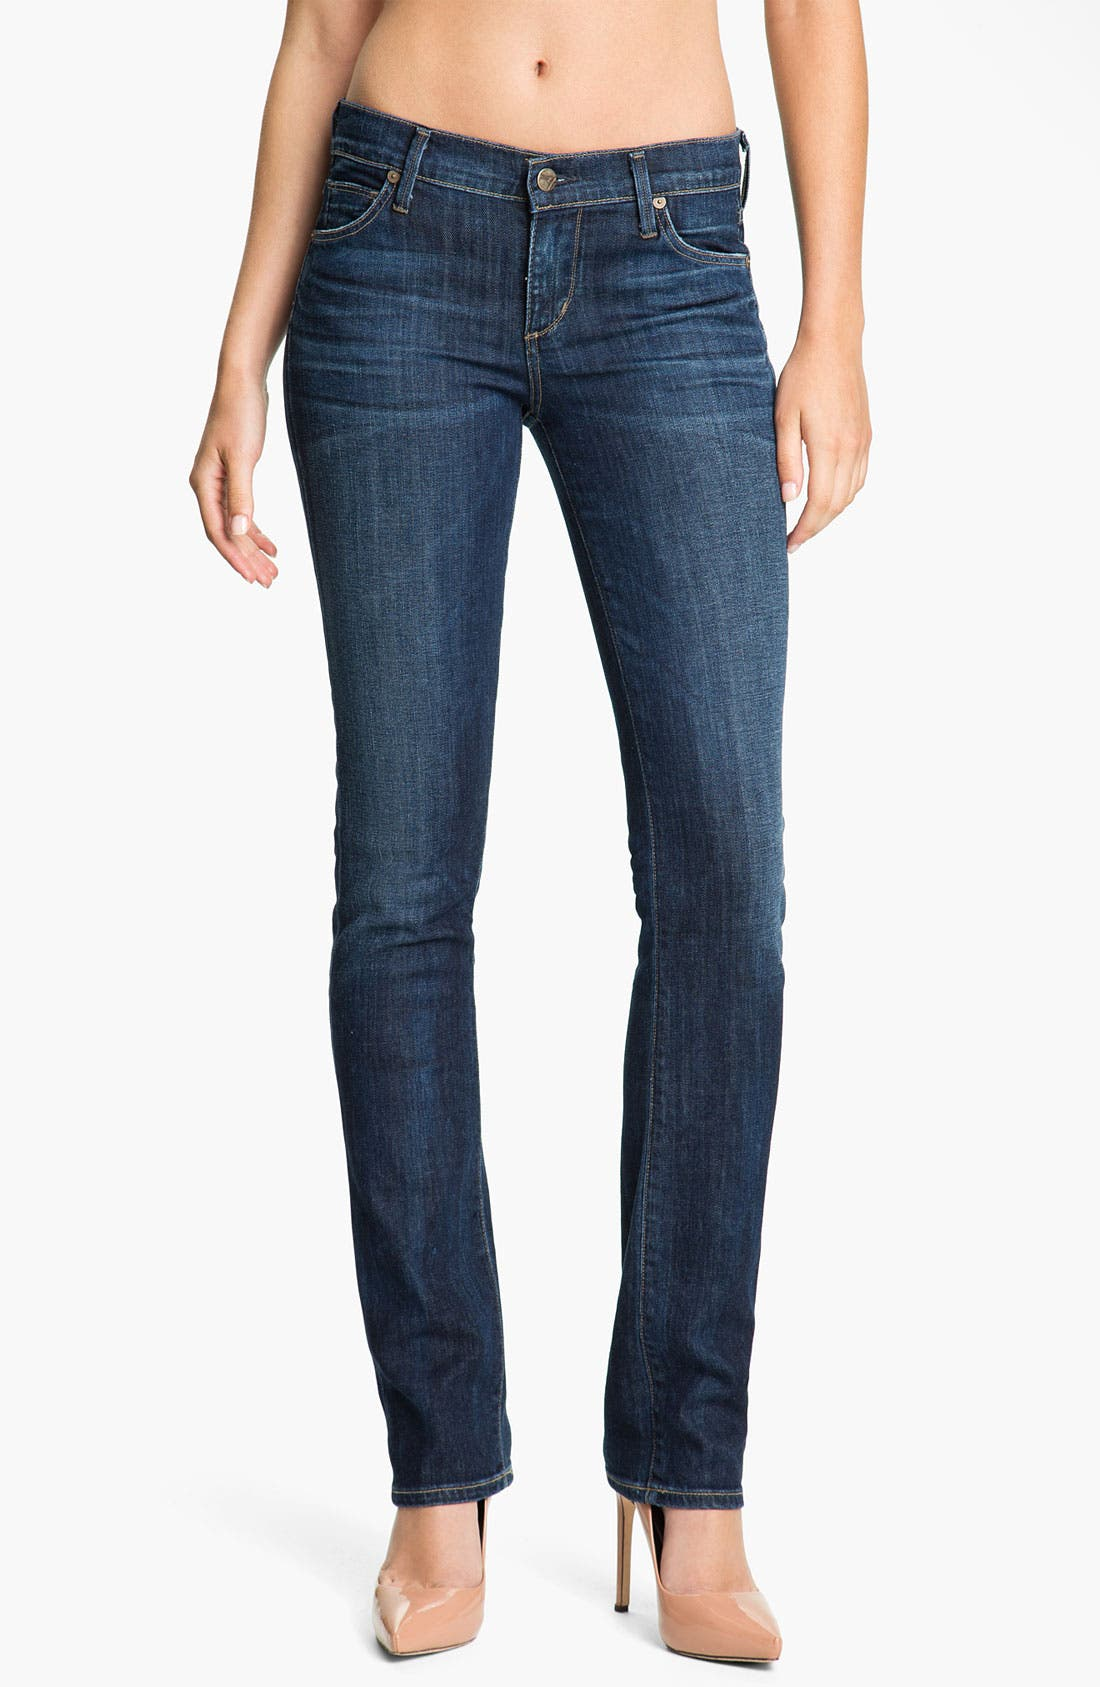 Alternate Image 1 Selected - Citizens of Humanity 'Ava' Straight Leg Stretch Denim Jeans (New Spectrum)